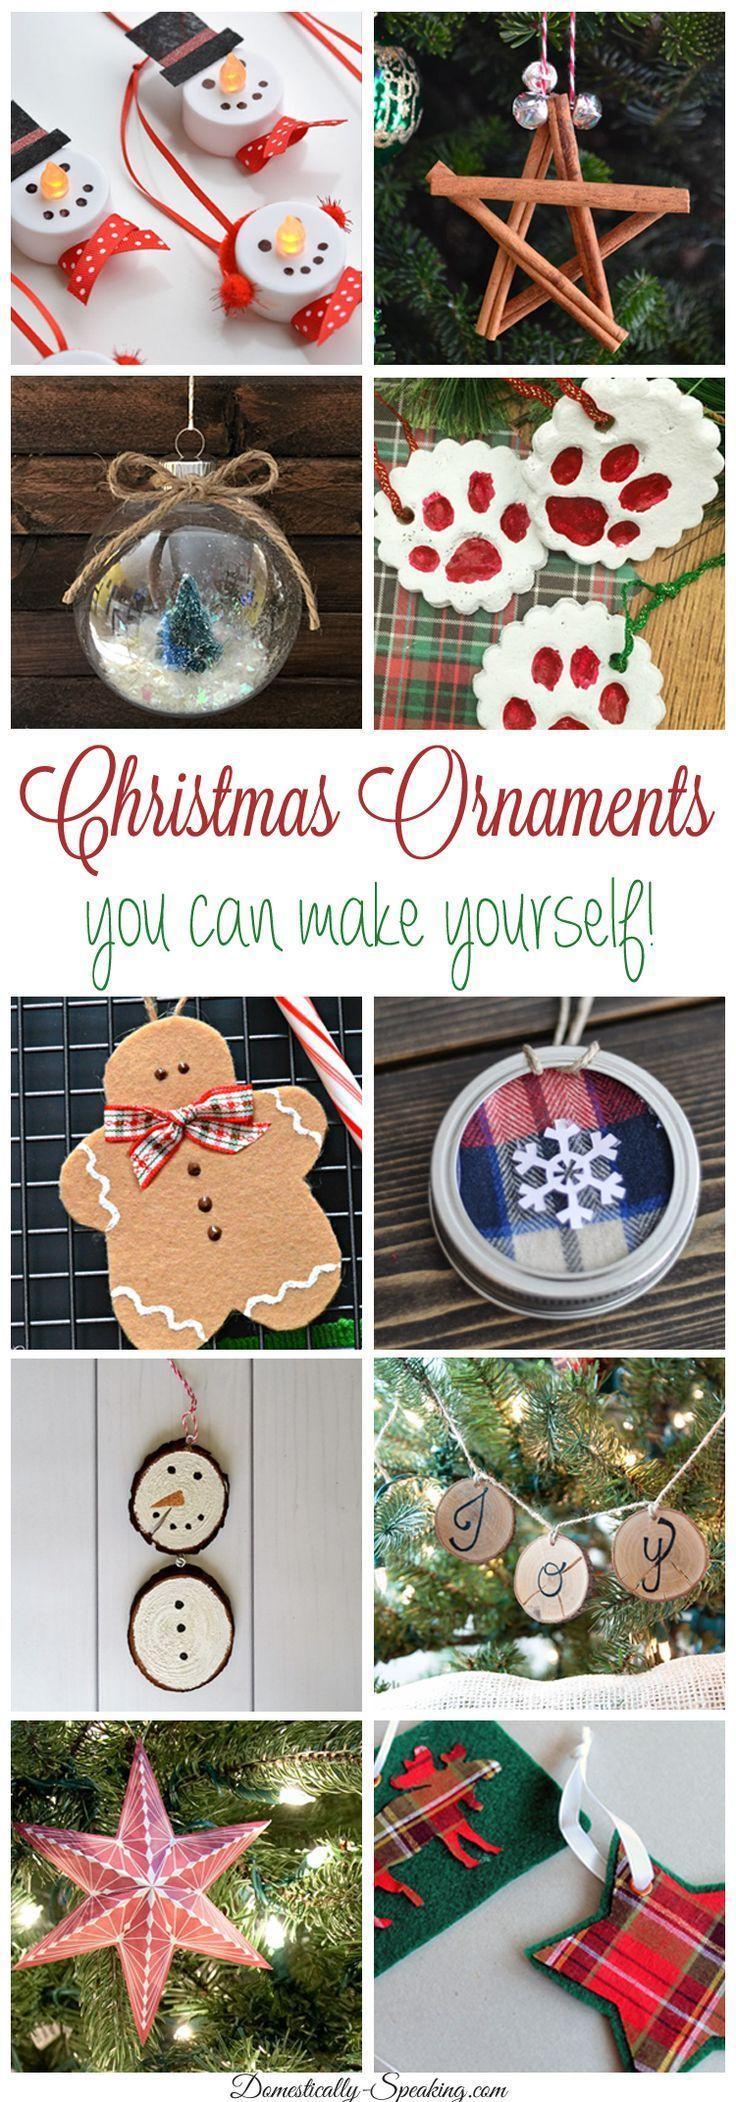 Christmas decorations you can make yourself - Diy Christmas Ornaments